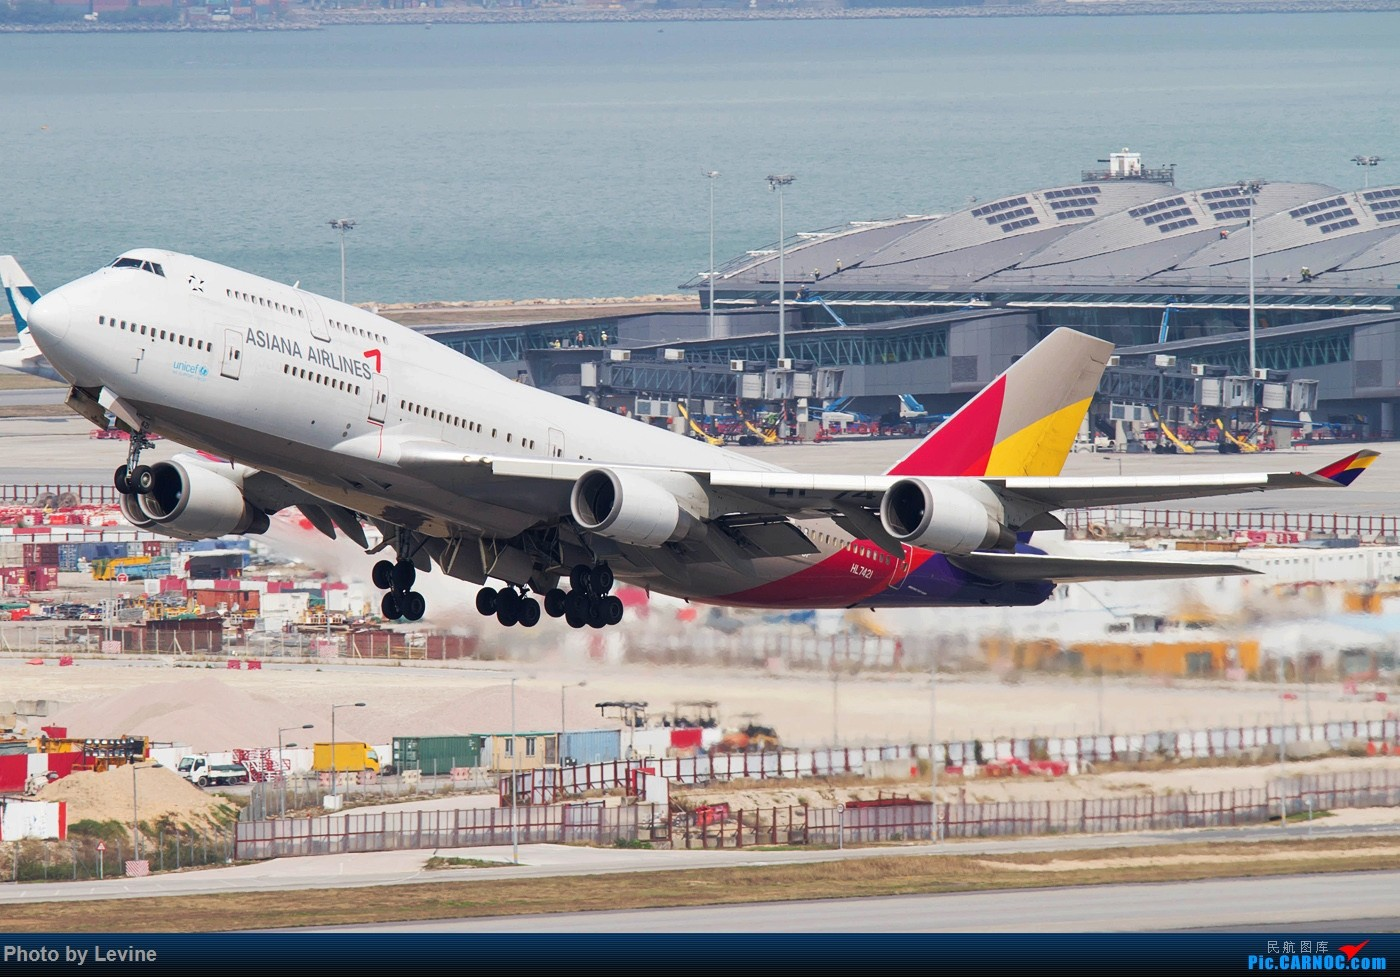 Re:[原创]今冬沙螺湾 迟来的图片 BOEING 747-400 HL7421 中国香港国际机场